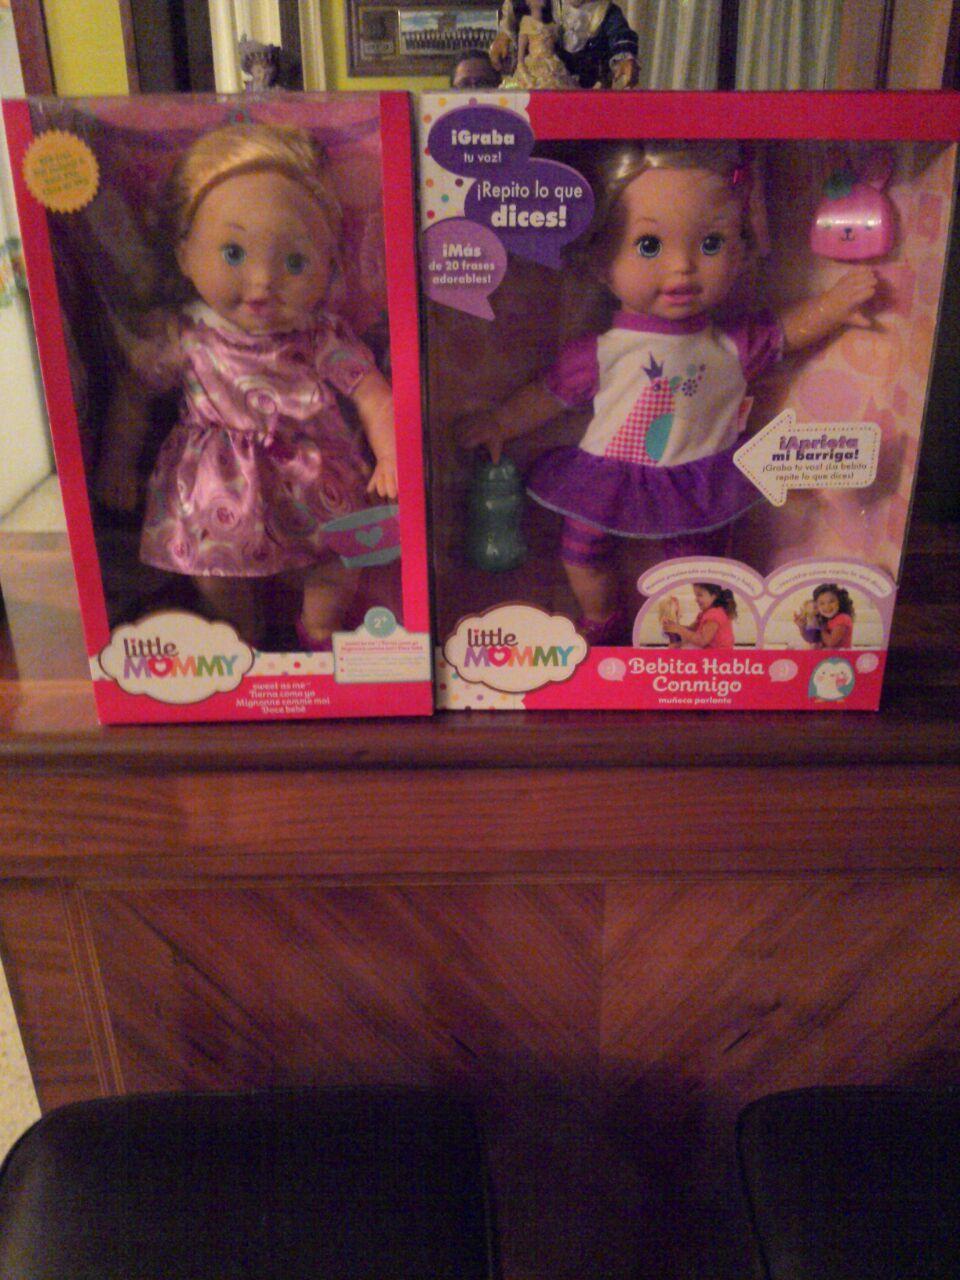 Walmart Rosario: Barbie y Little momy